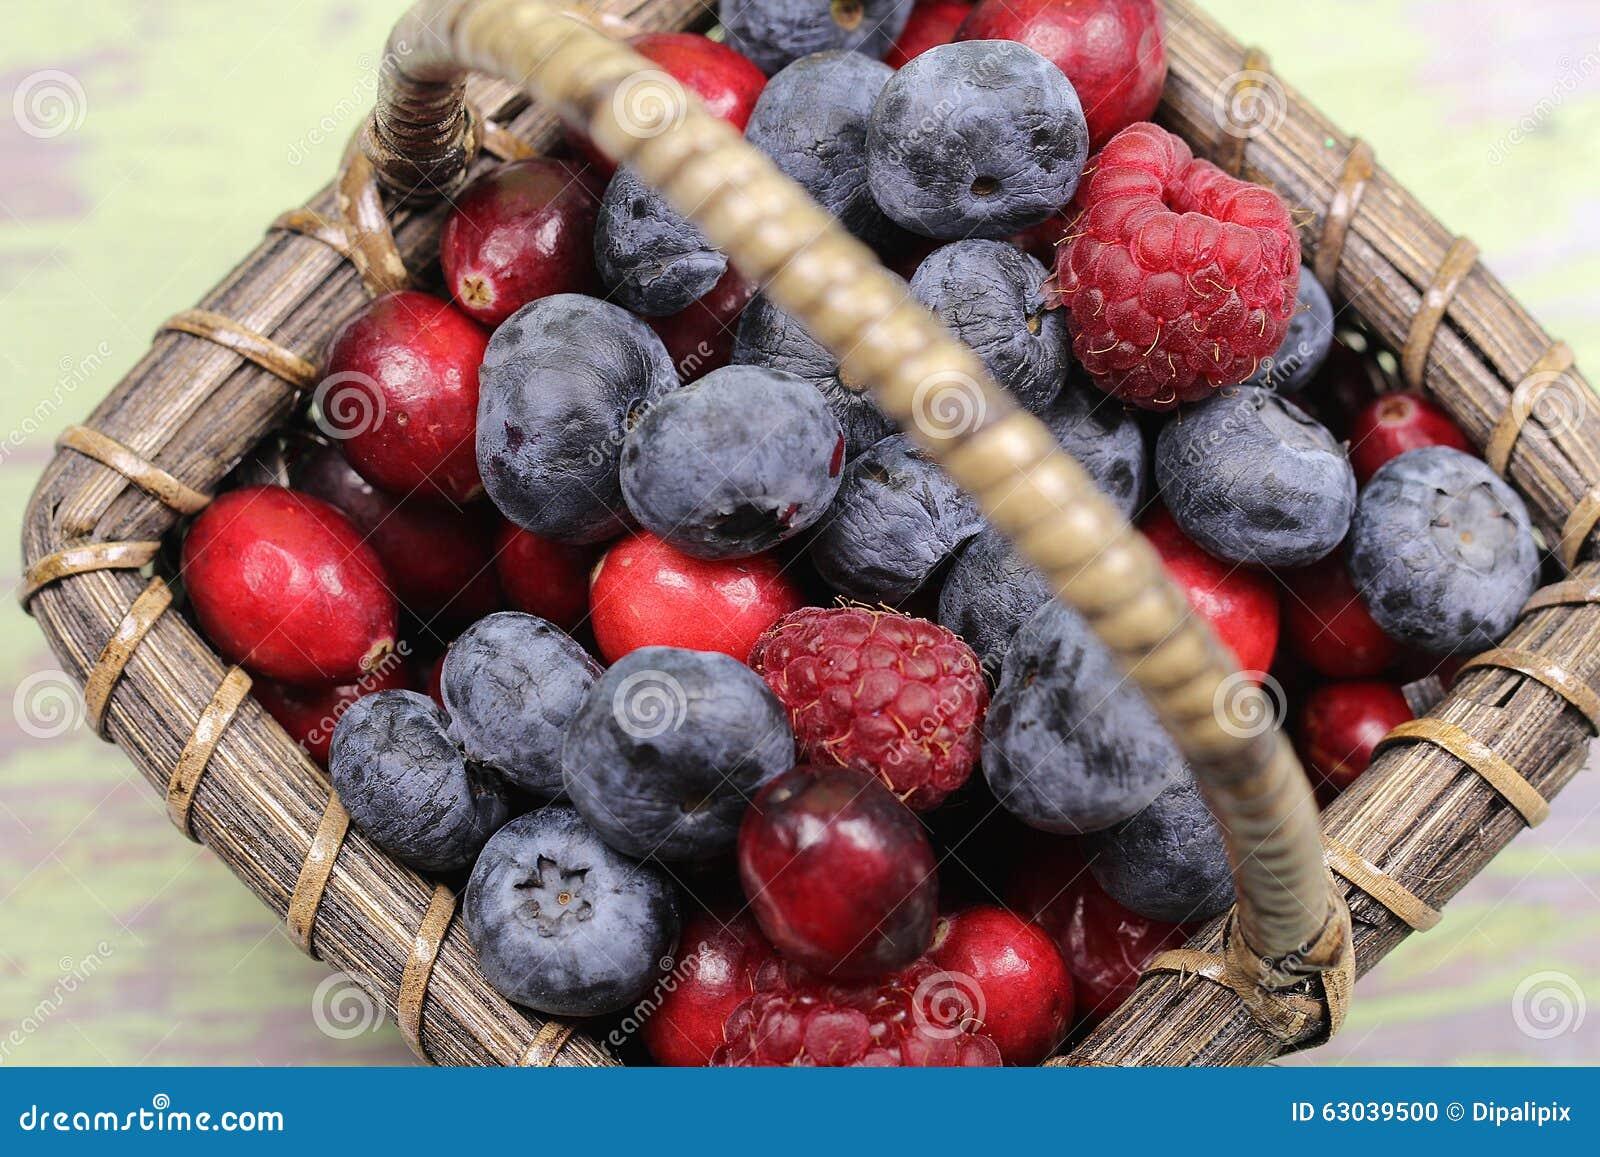 Wooden Berry Basket Mixed Berries